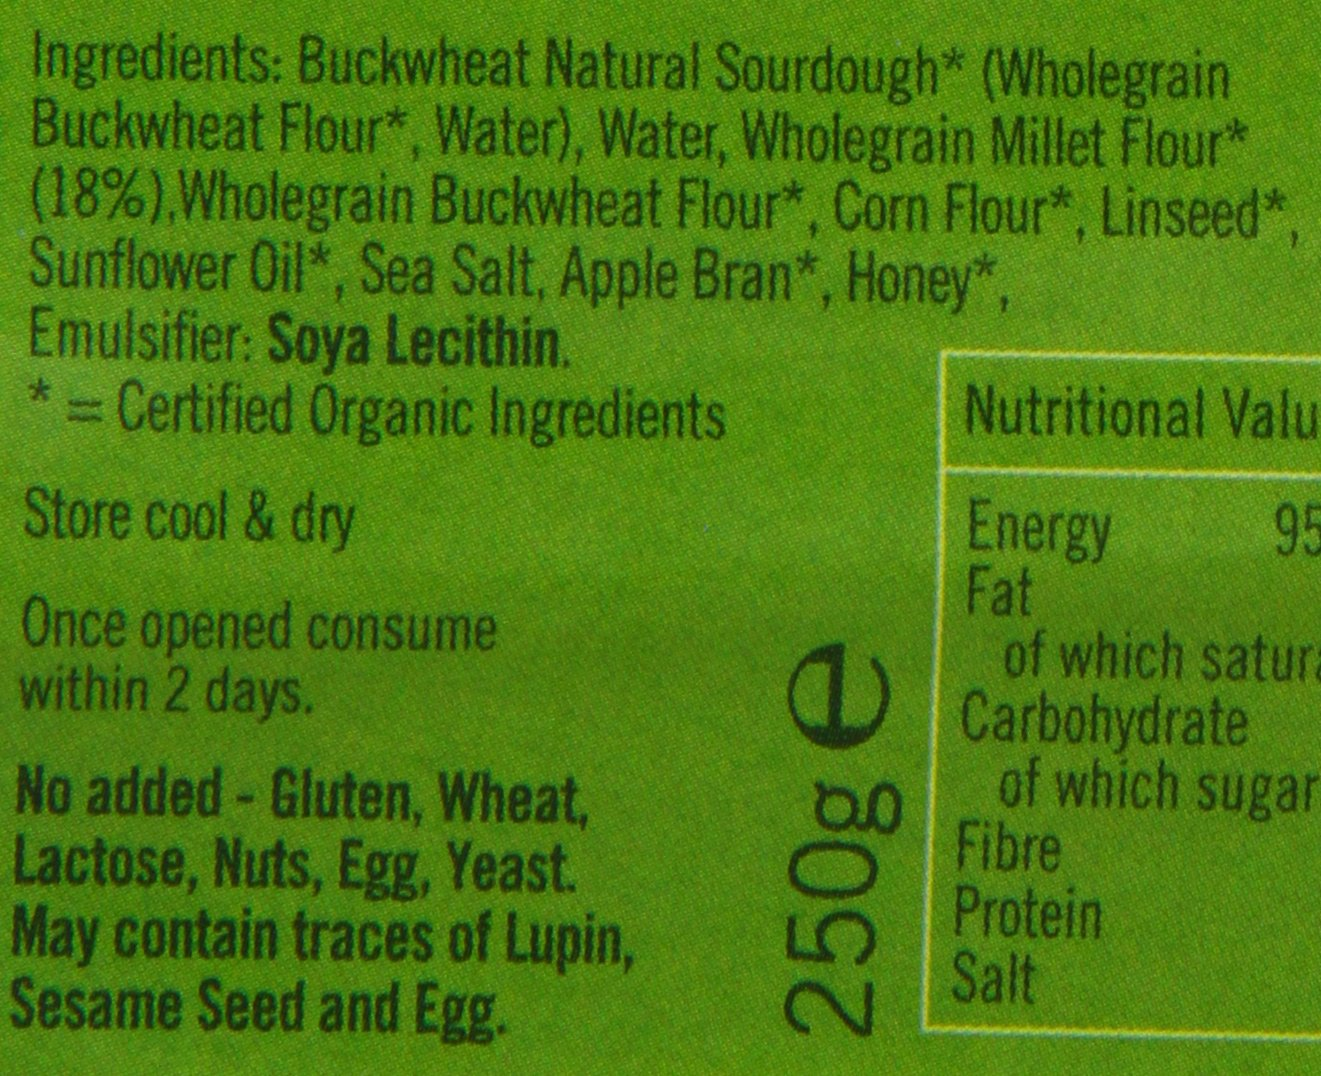 Biona buckwheat and millet bread